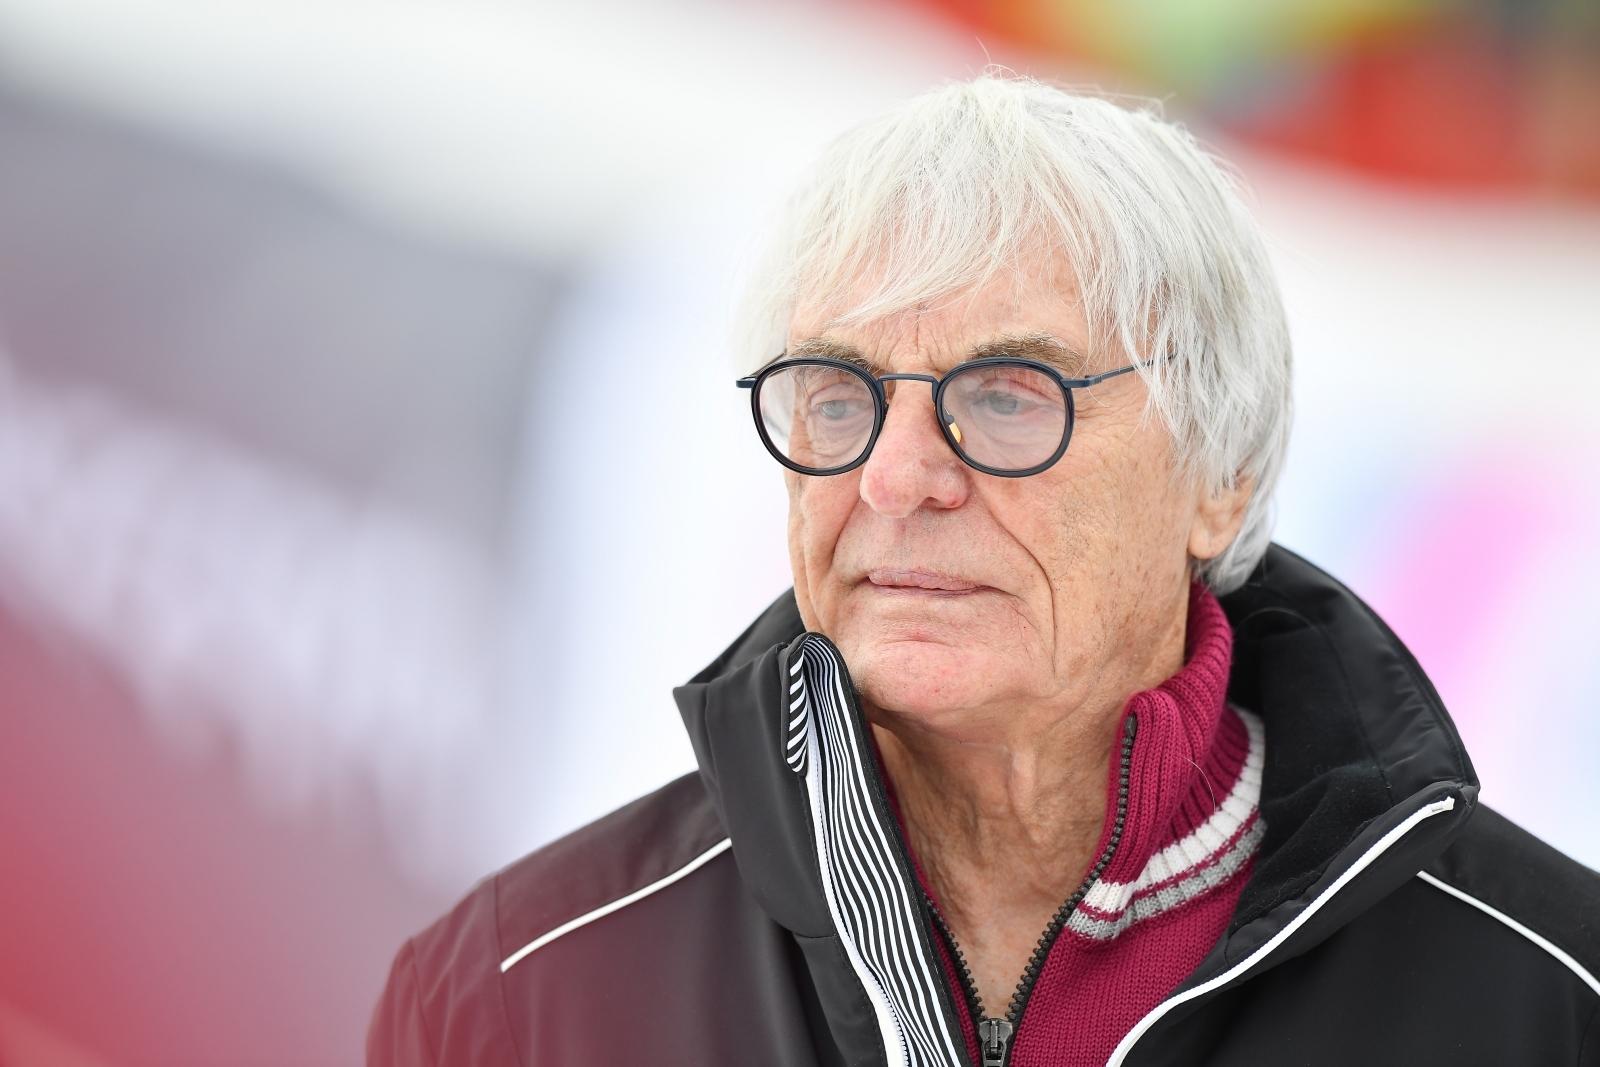 F1: Bernie Ecclestone quashes talk of rival series - Sports  |Bernie Ecclestone